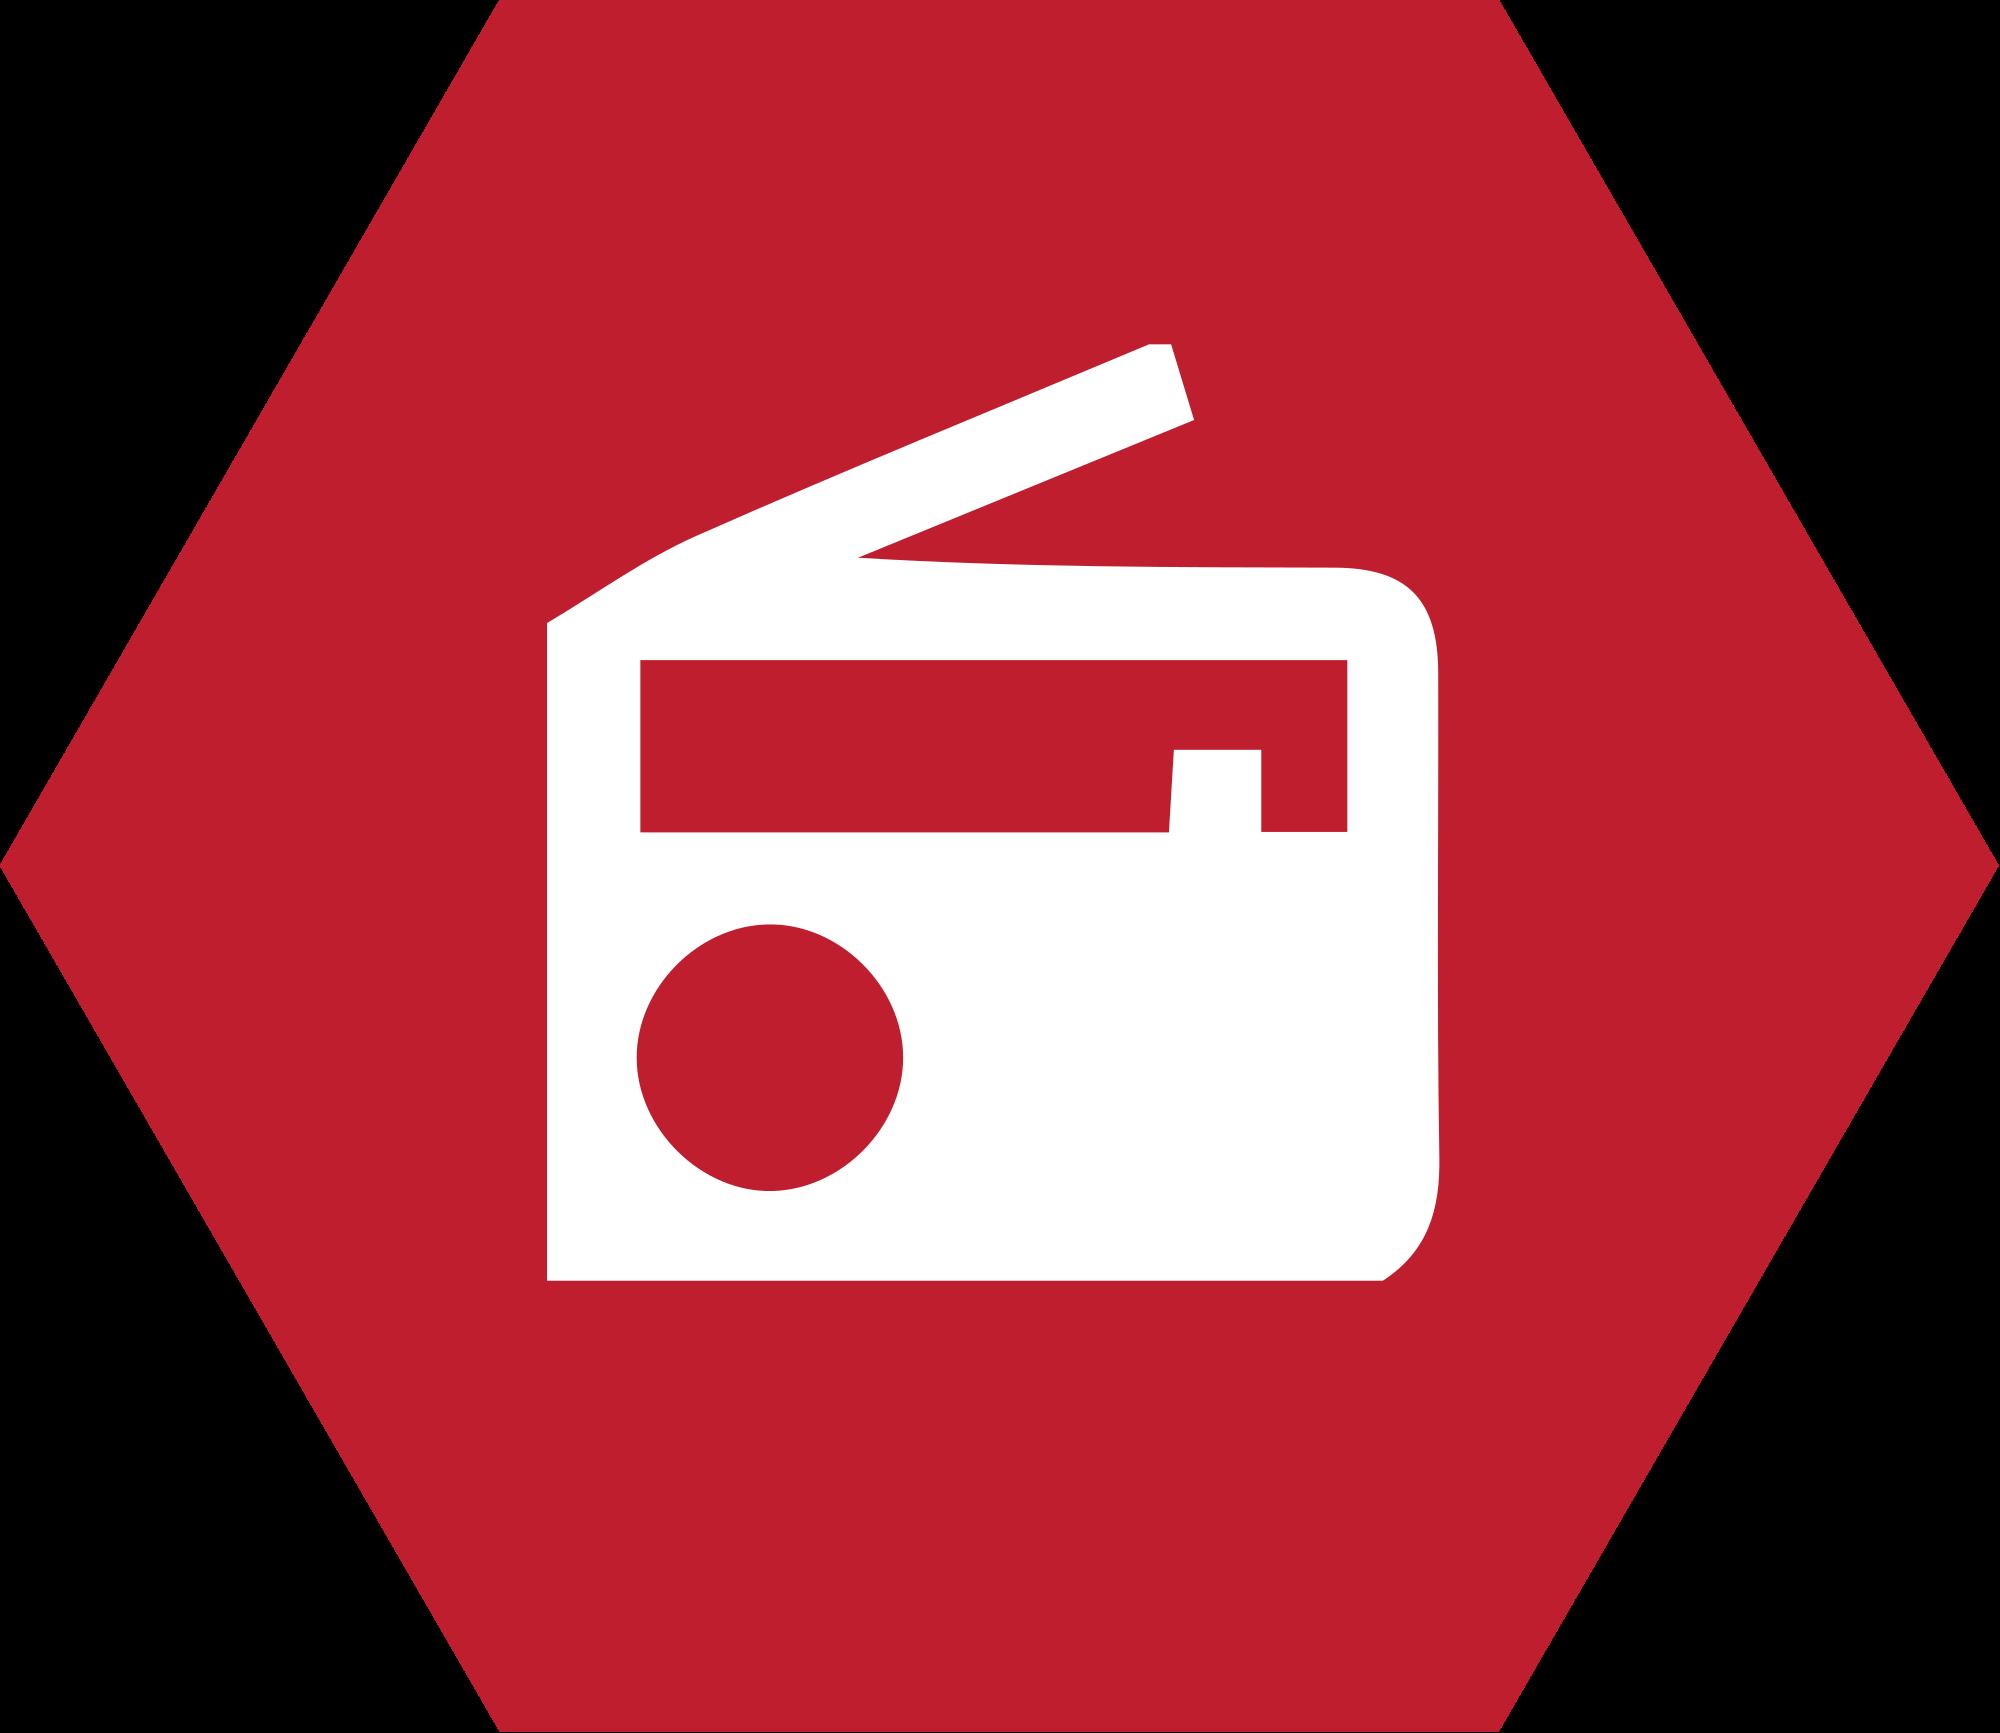 File radio icon svg. Hexagon clipart red